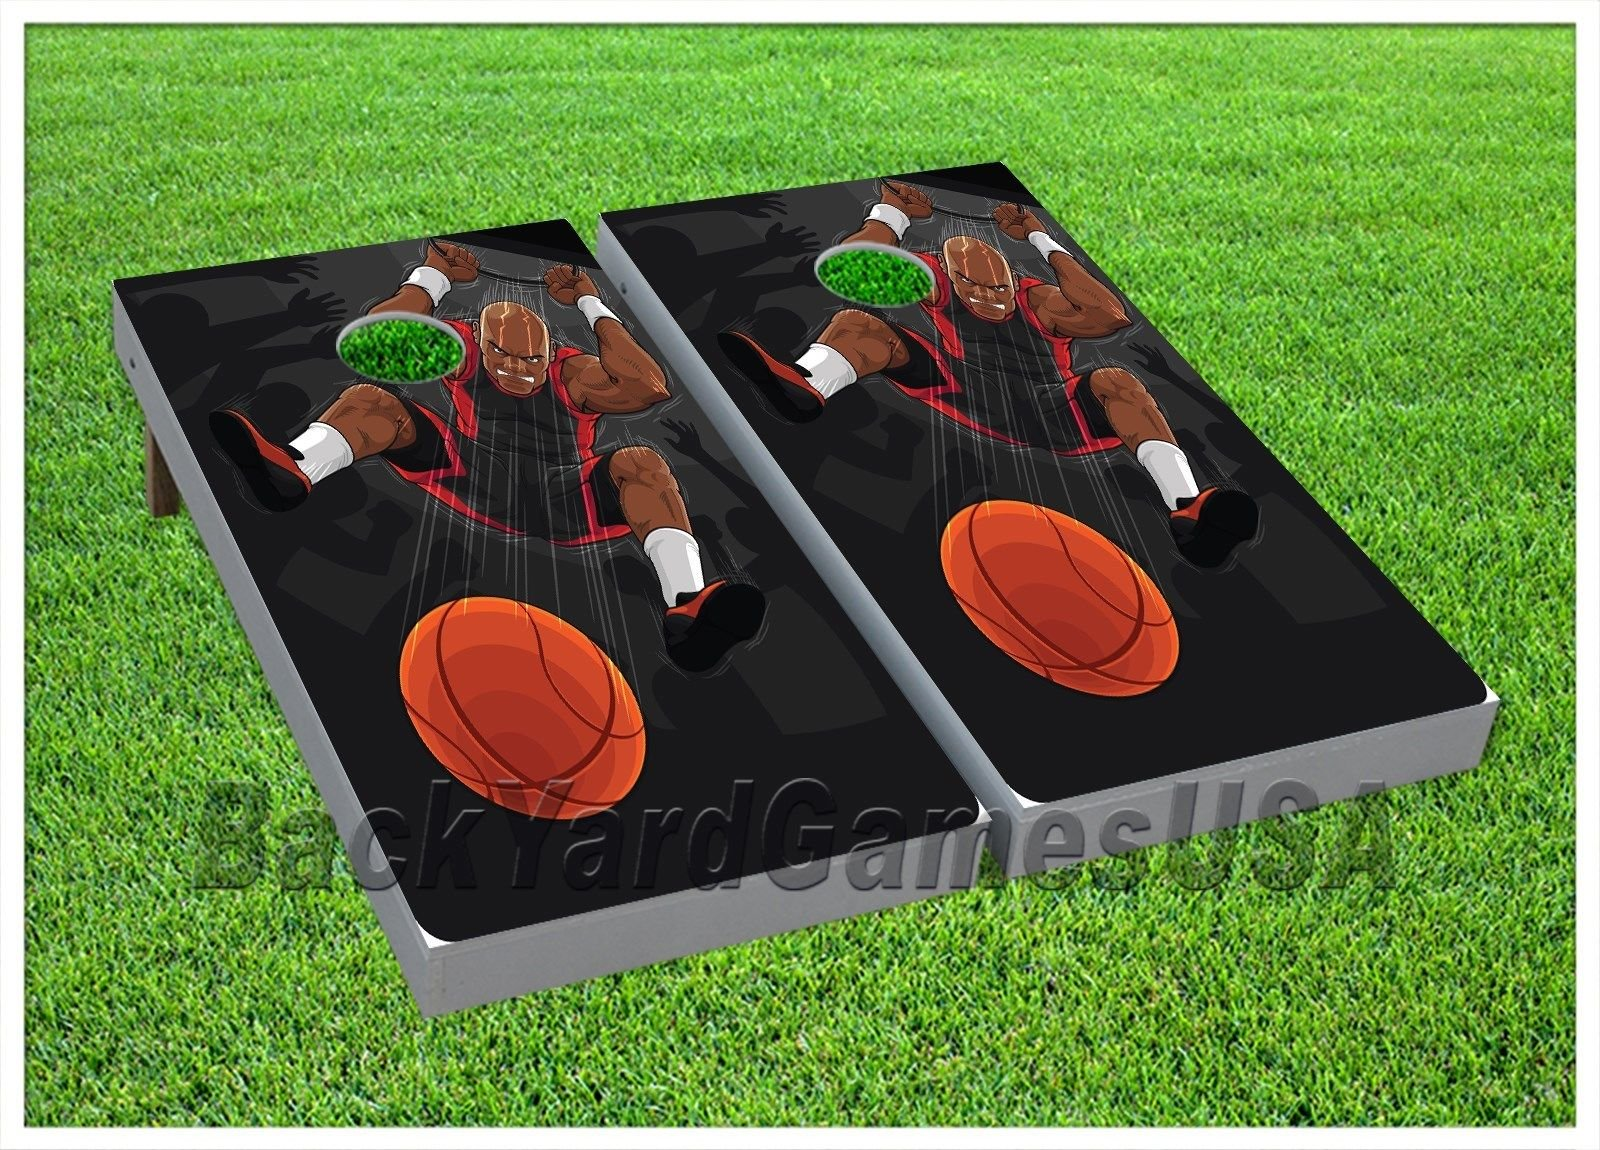 CORNHOLE BEANBAG TOSS GAME w Bags Game Board Massive Dunk NBA Fans Set 493 by BackYardGamesUSA